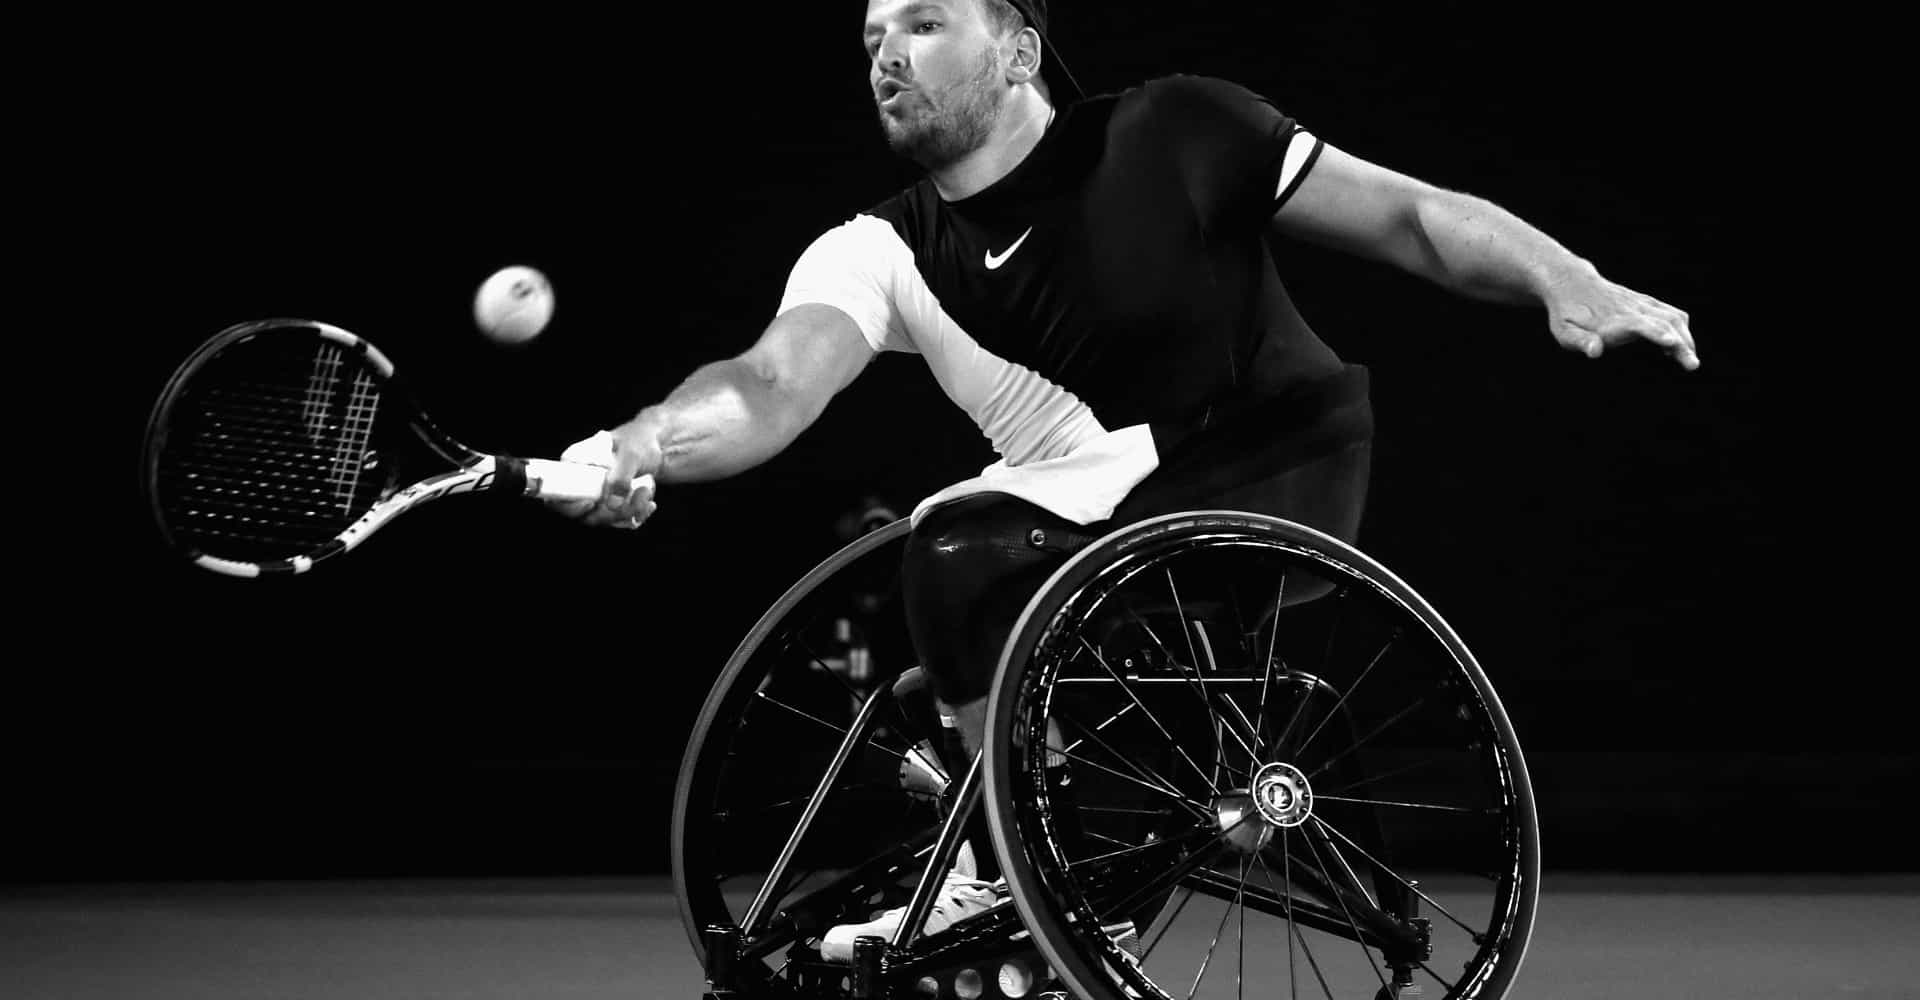 Aussie Dylan Alcott wins his second U.S. Open title